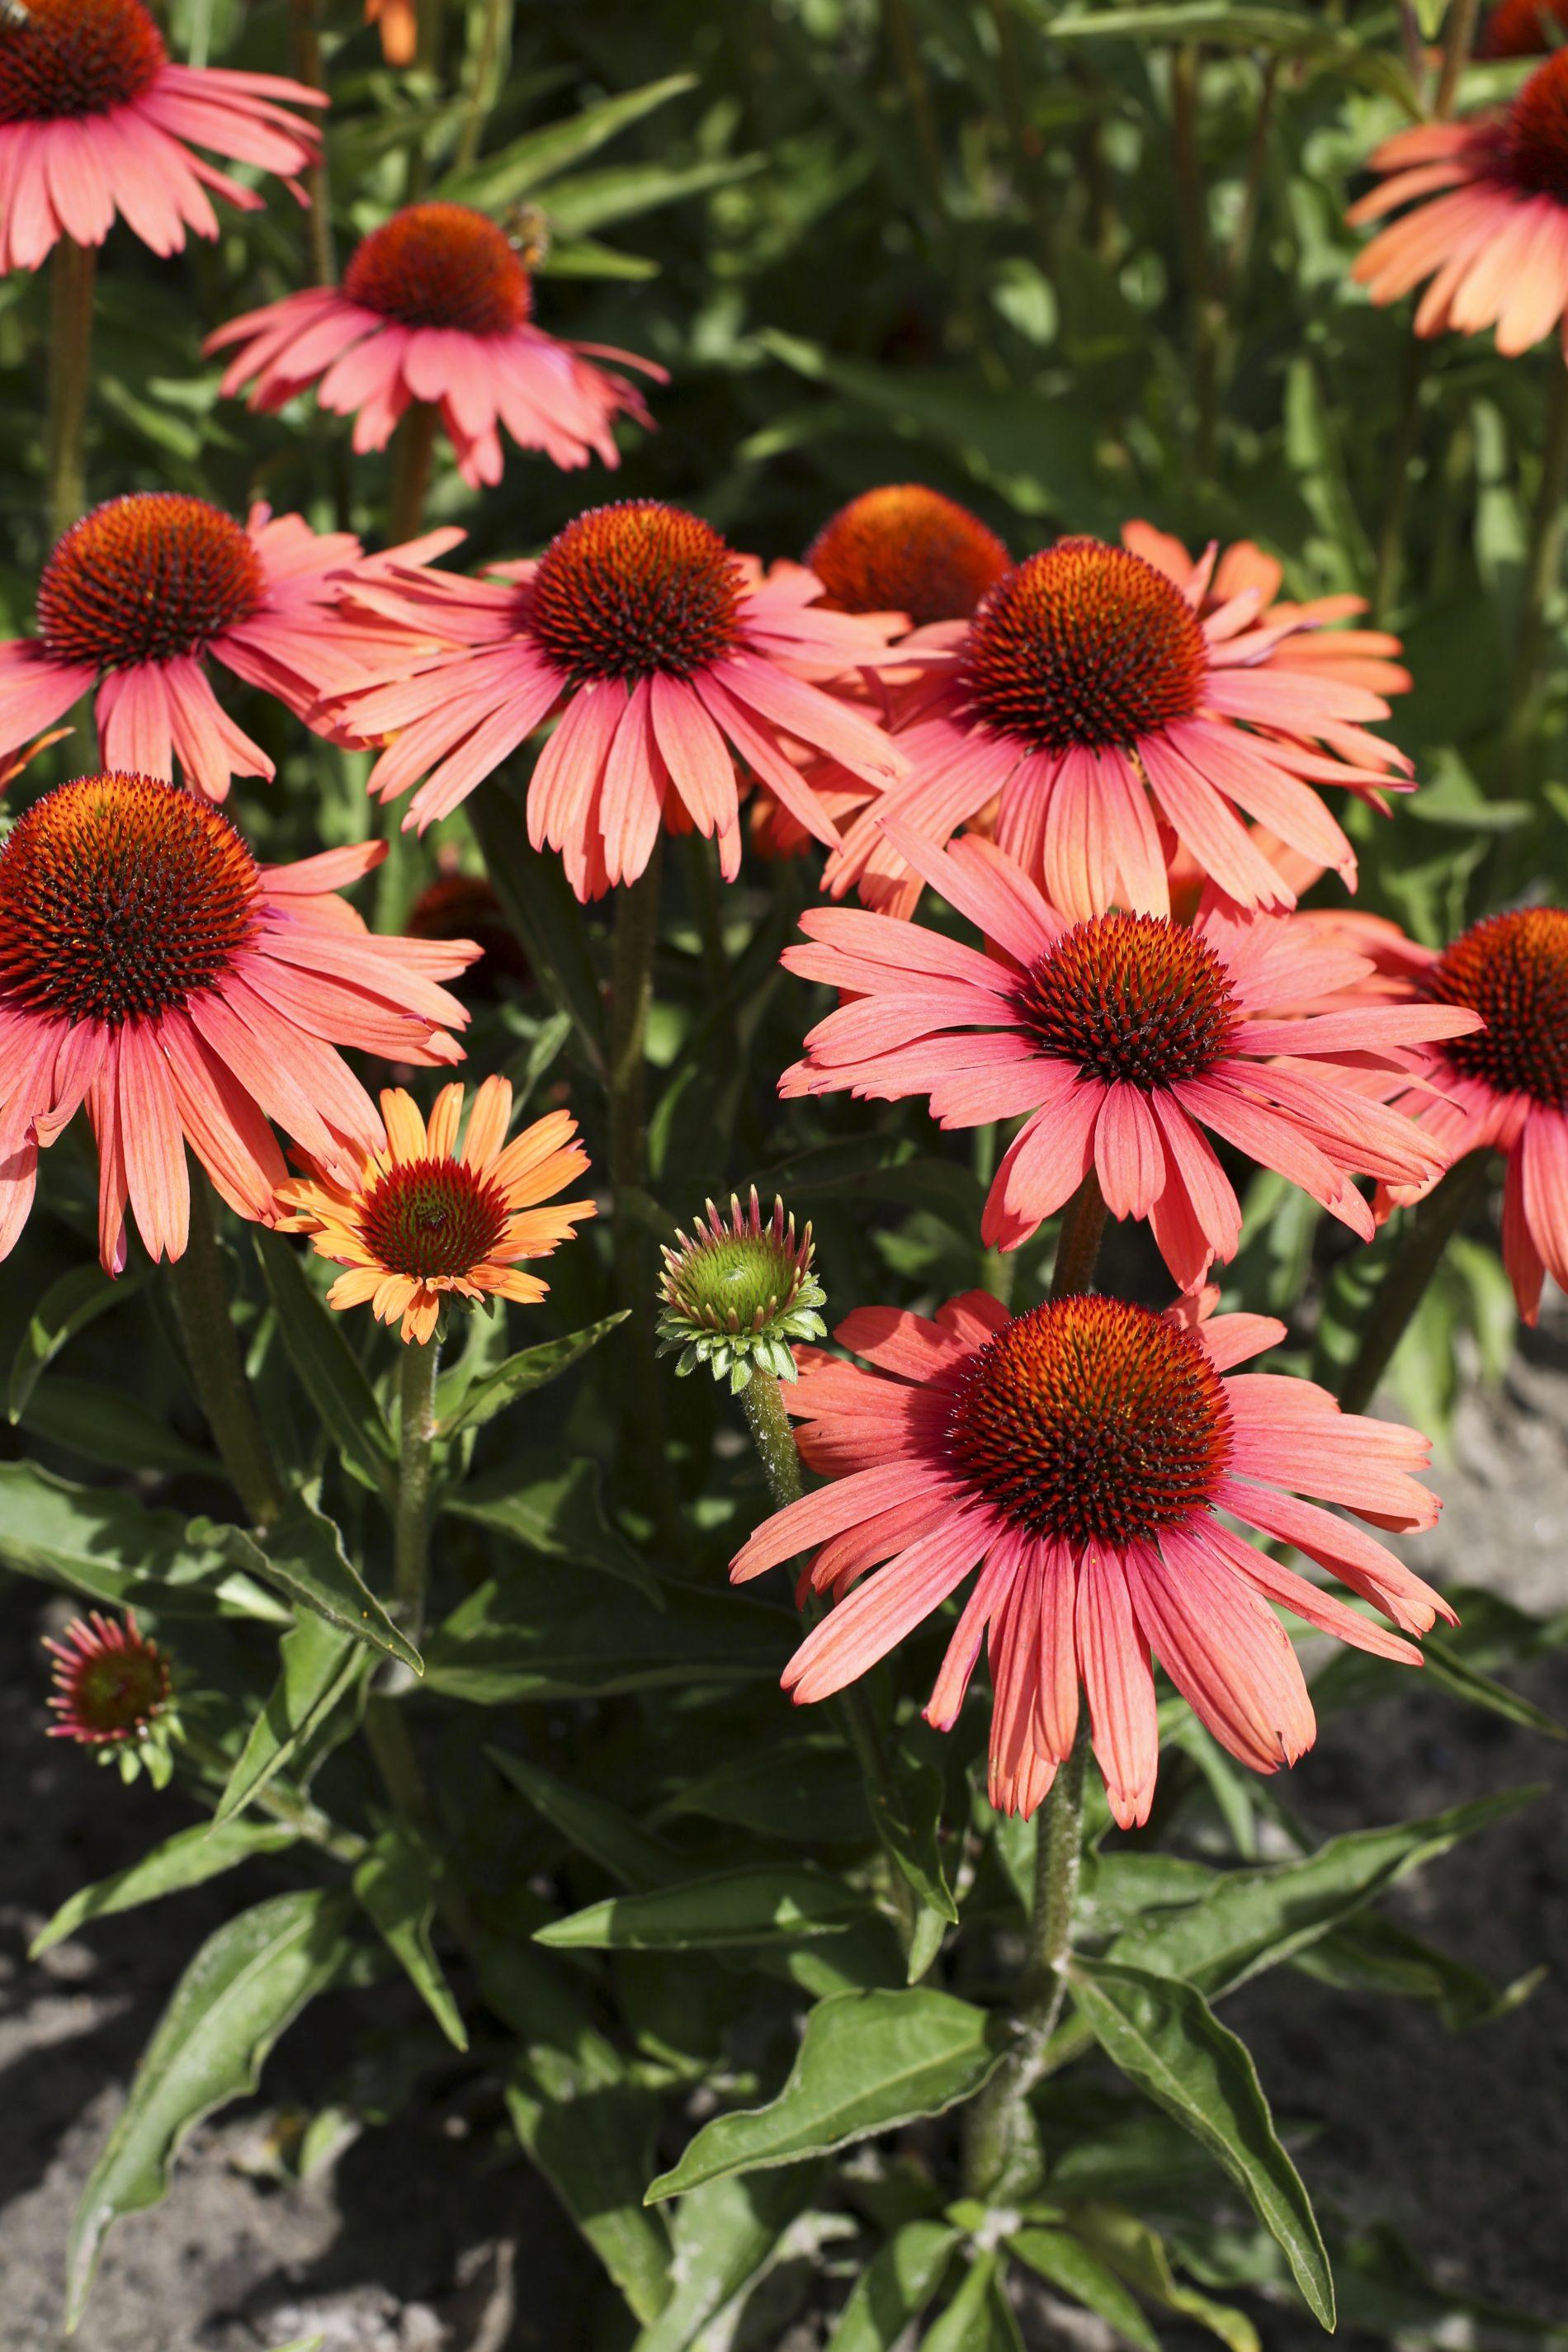 Kismet Red Echinacea 1x Staude Garten Pflanze Sonnenhut